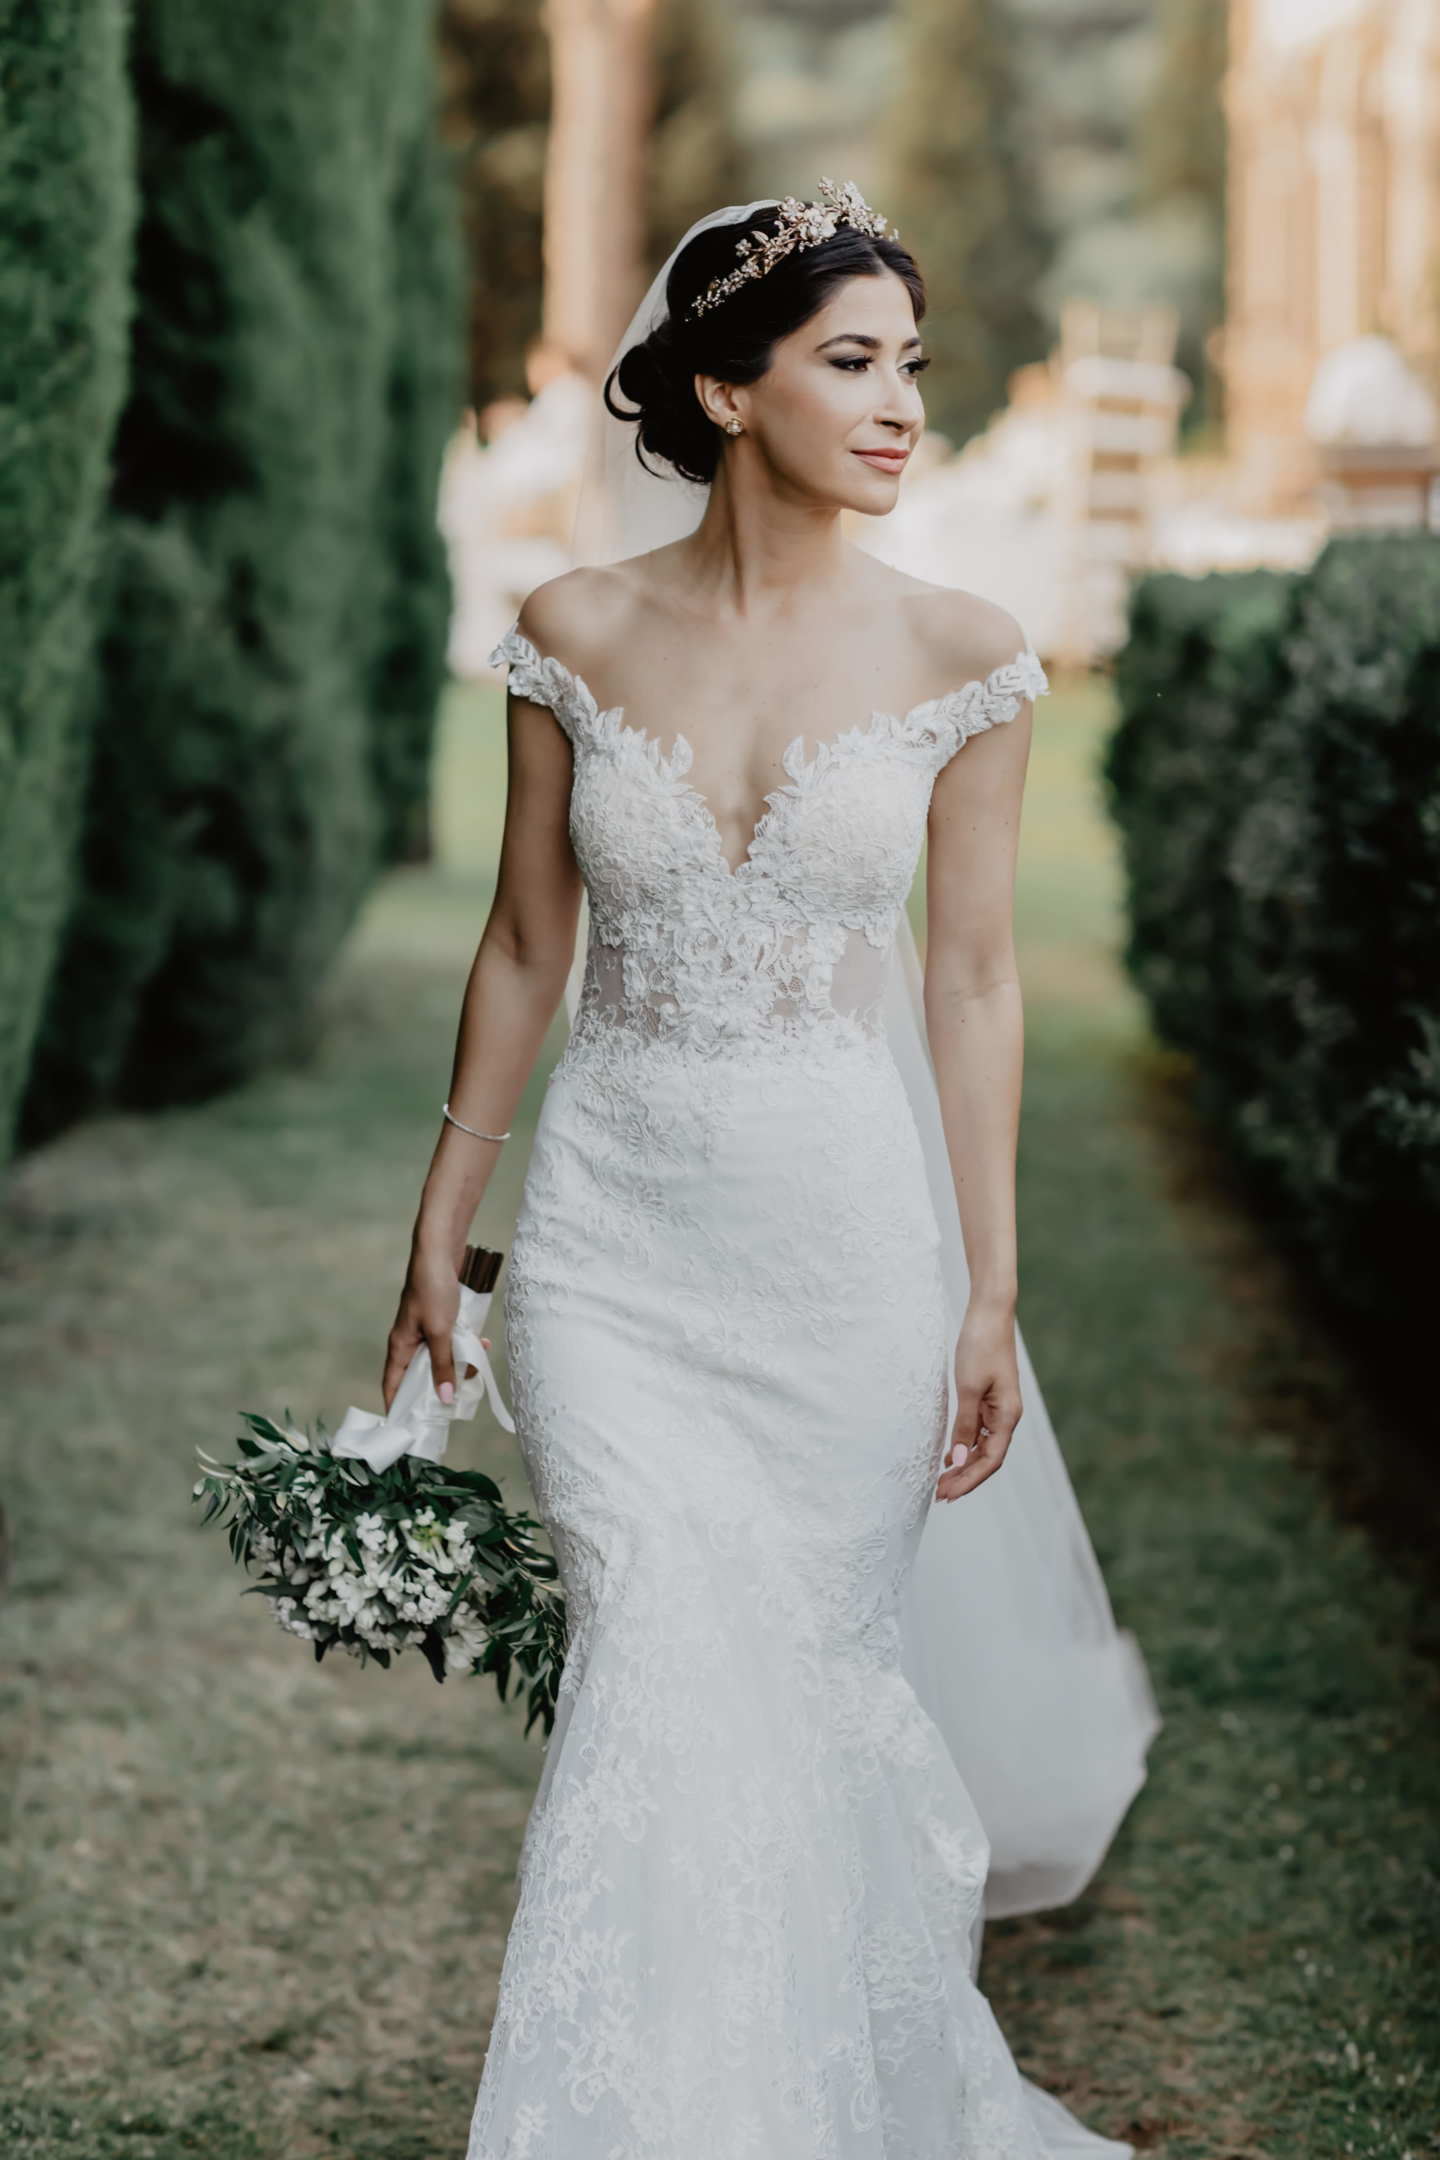 Bride portrait: when beauty comes from happiness :: Bride's portrait: when beauty comes from happiness :: Luxury wedding photography - 15 :: Bride portrait: when beauty comes from happiness